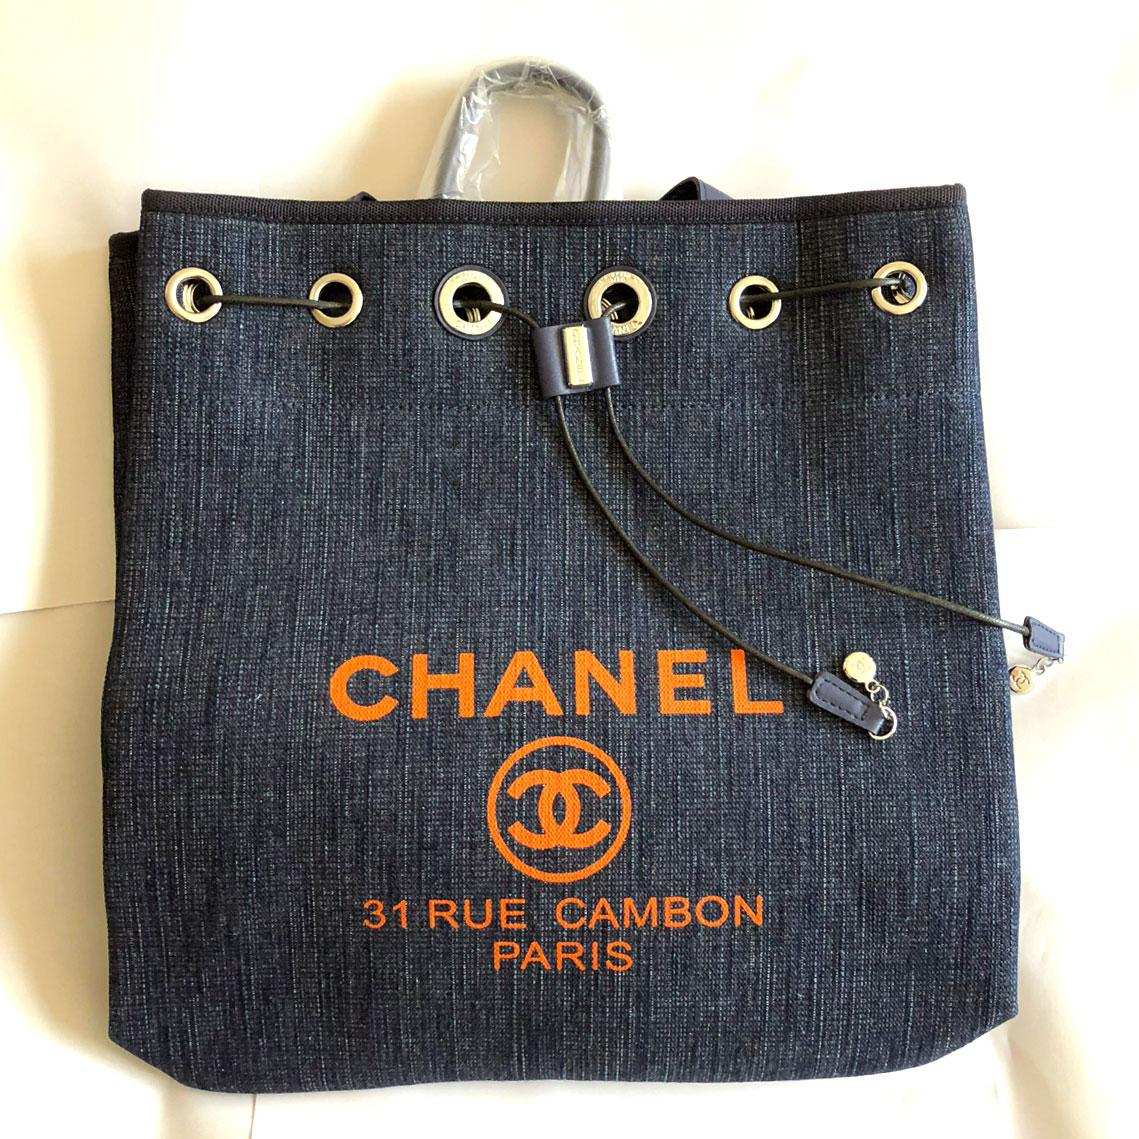 CHANEL シャネル リュック パリ, EUで流行中 パリの元デザイナーに「有償サンプル」で買い付け依頼品 上端有効幅約330mm